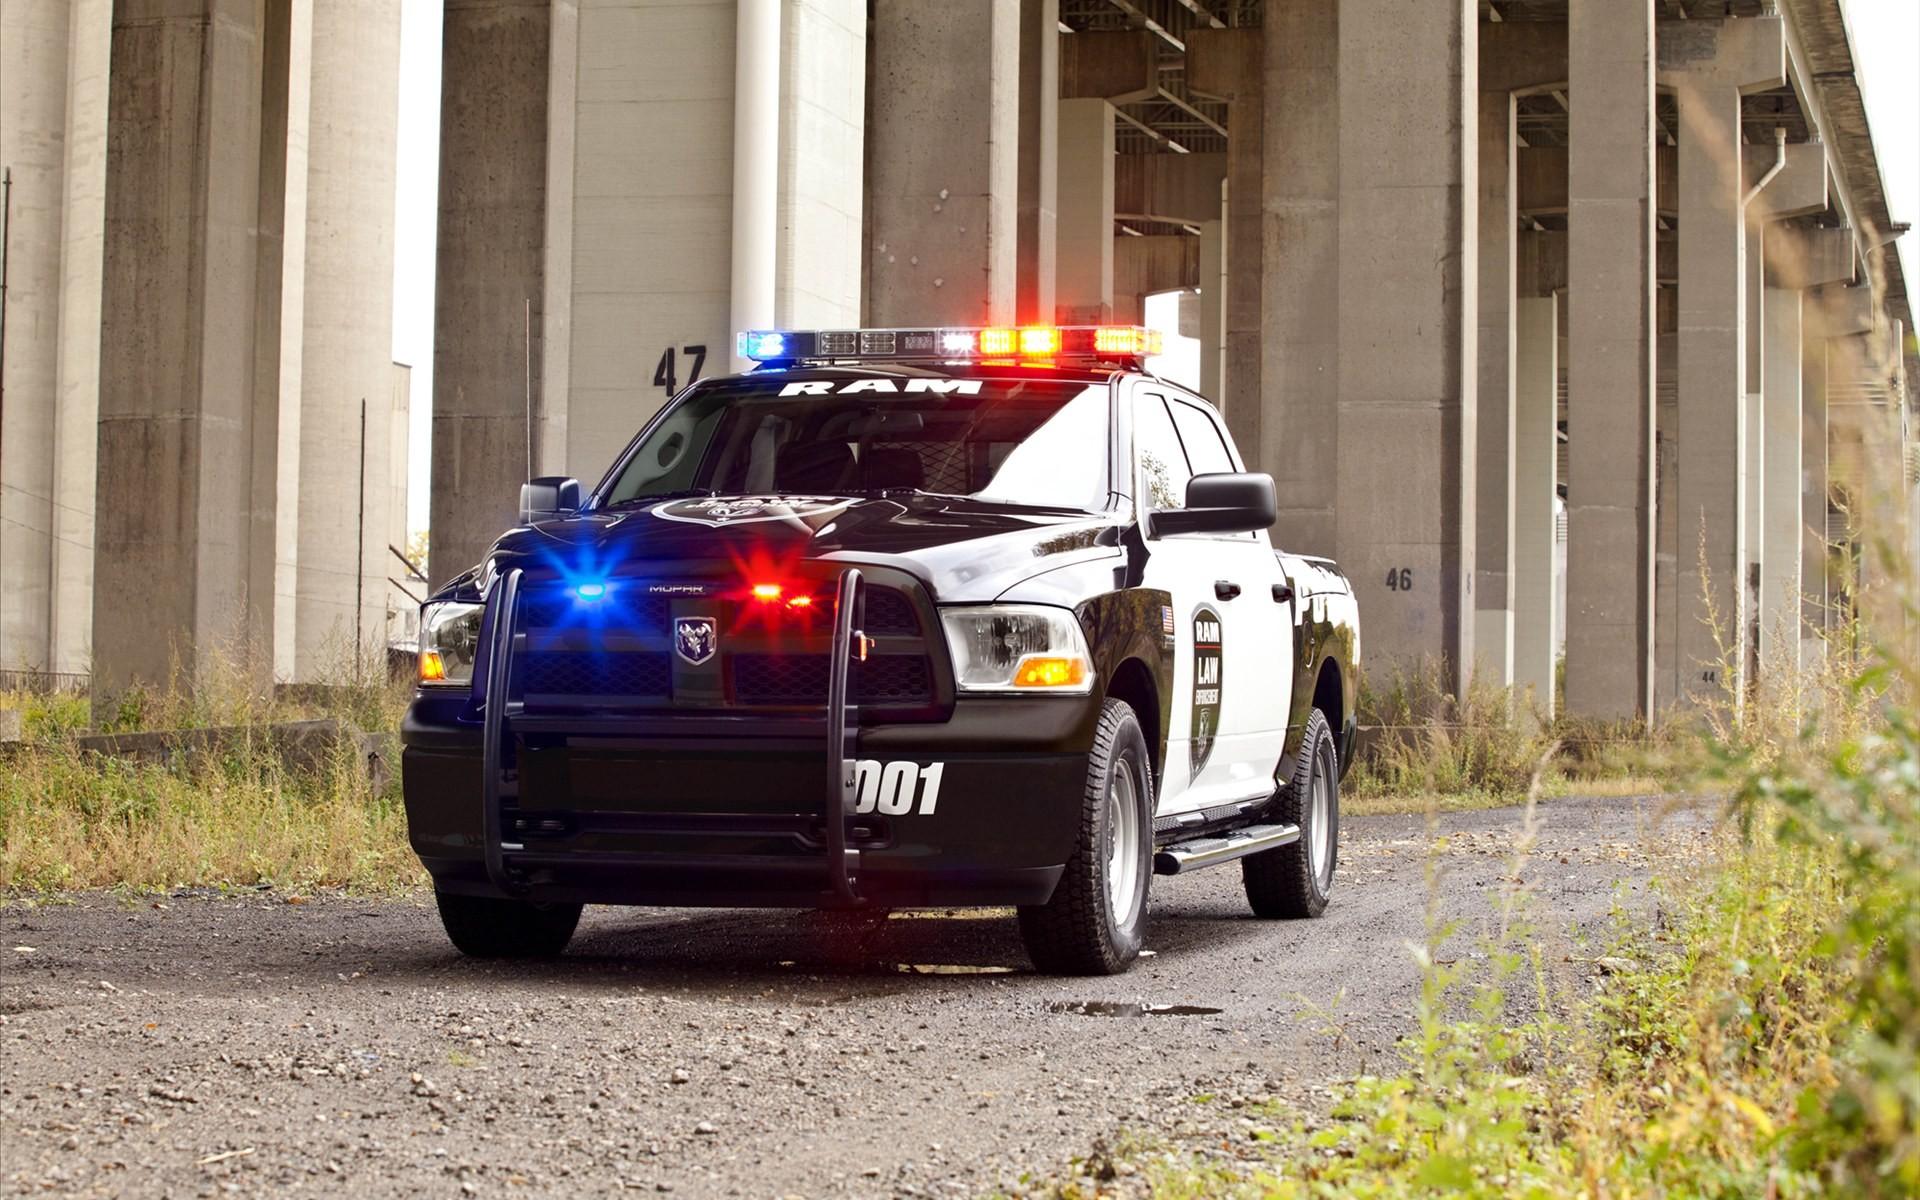 Dodge Ram Police Truck 2012